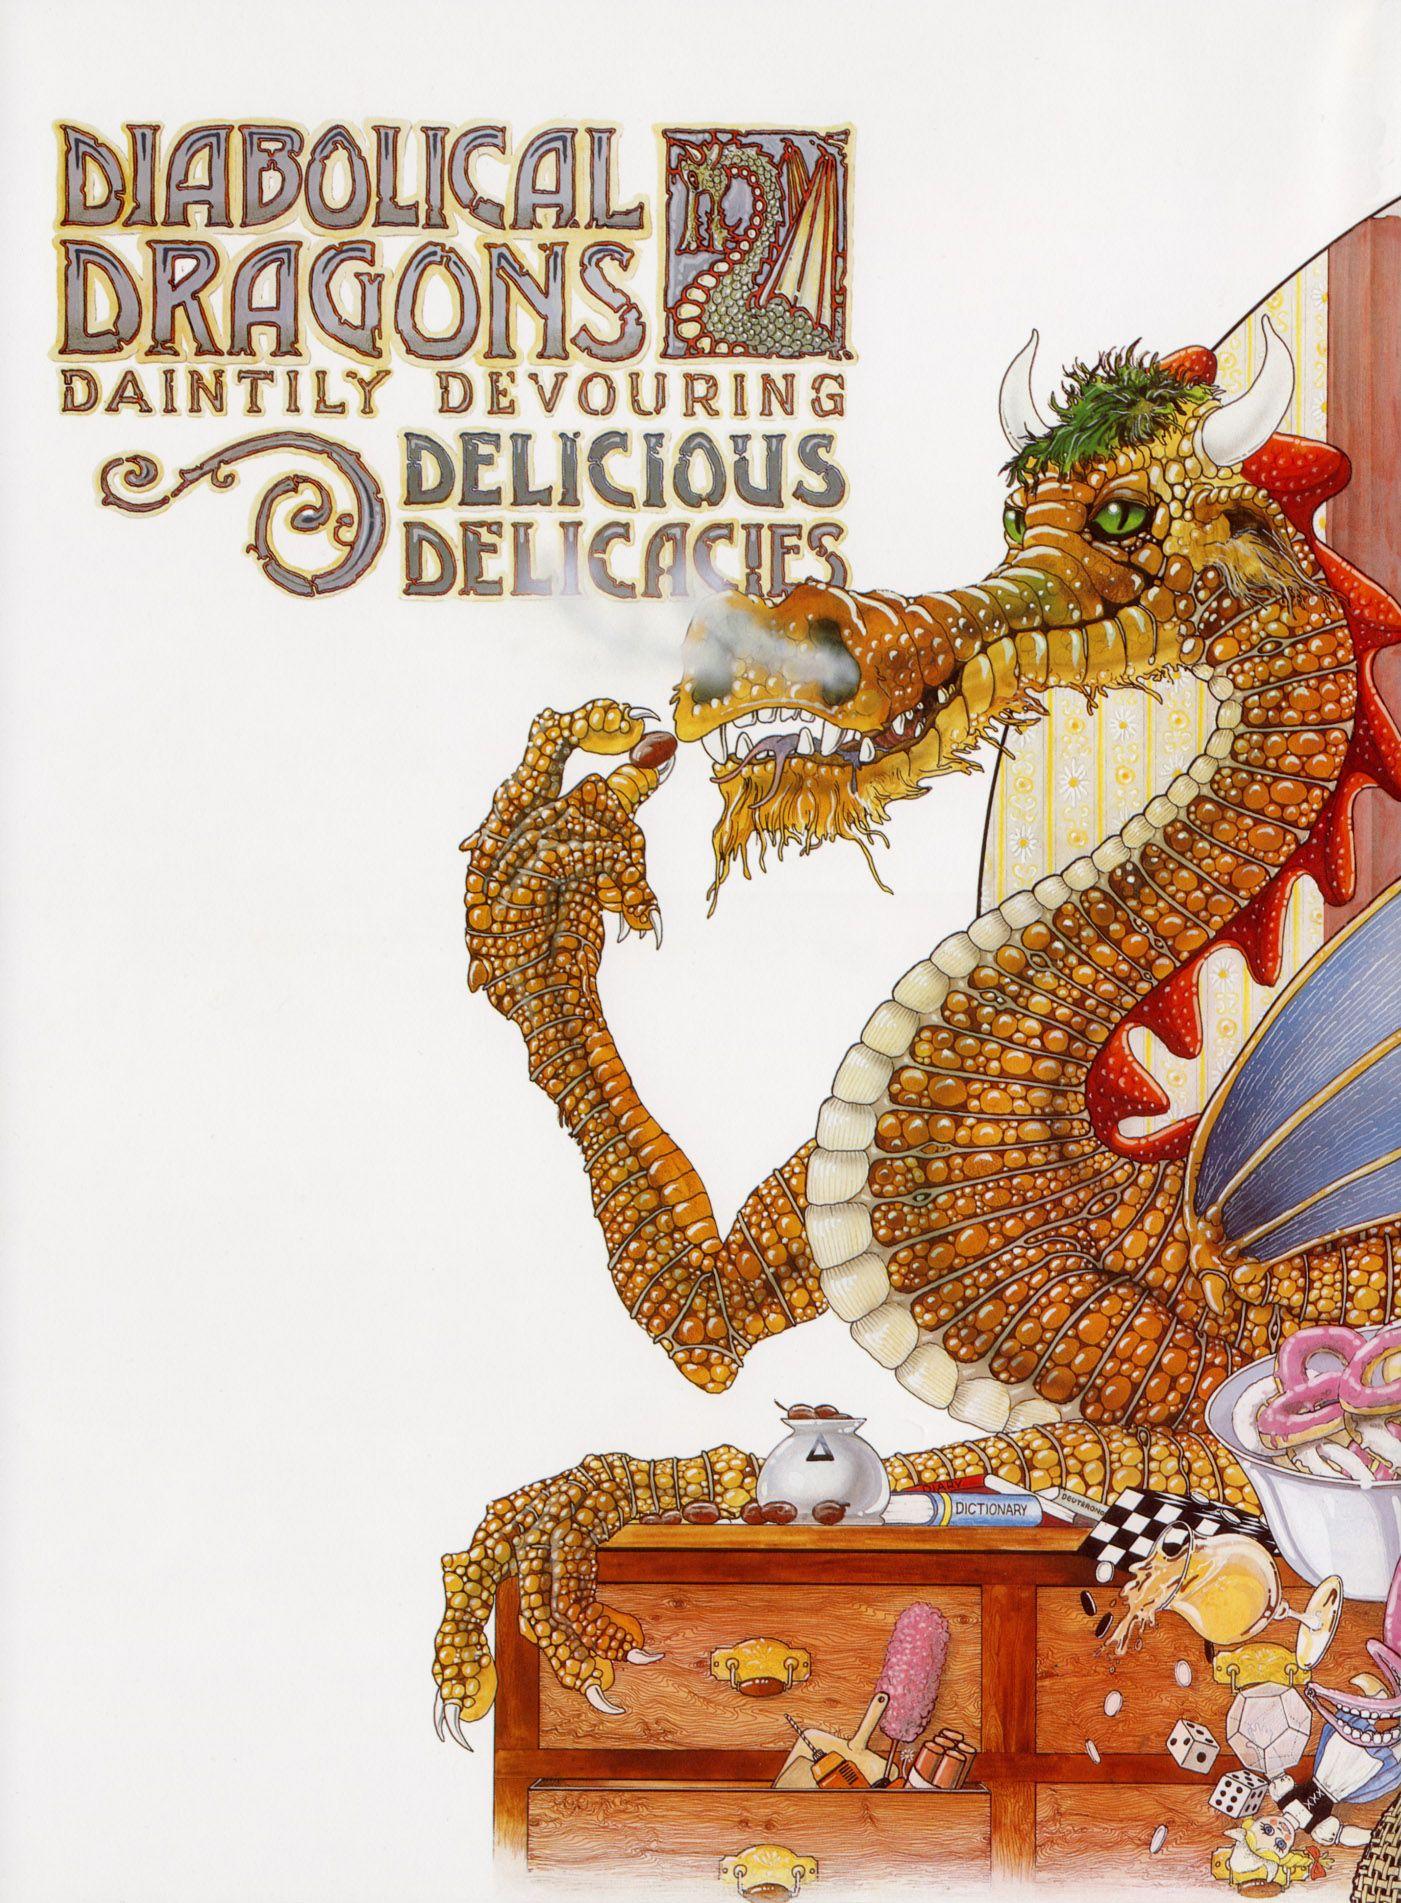 Dbs Graeme Base Animalia D Lhs Jpg 1401 1903 Dragon Dreaming Dragon Art Dragon Images